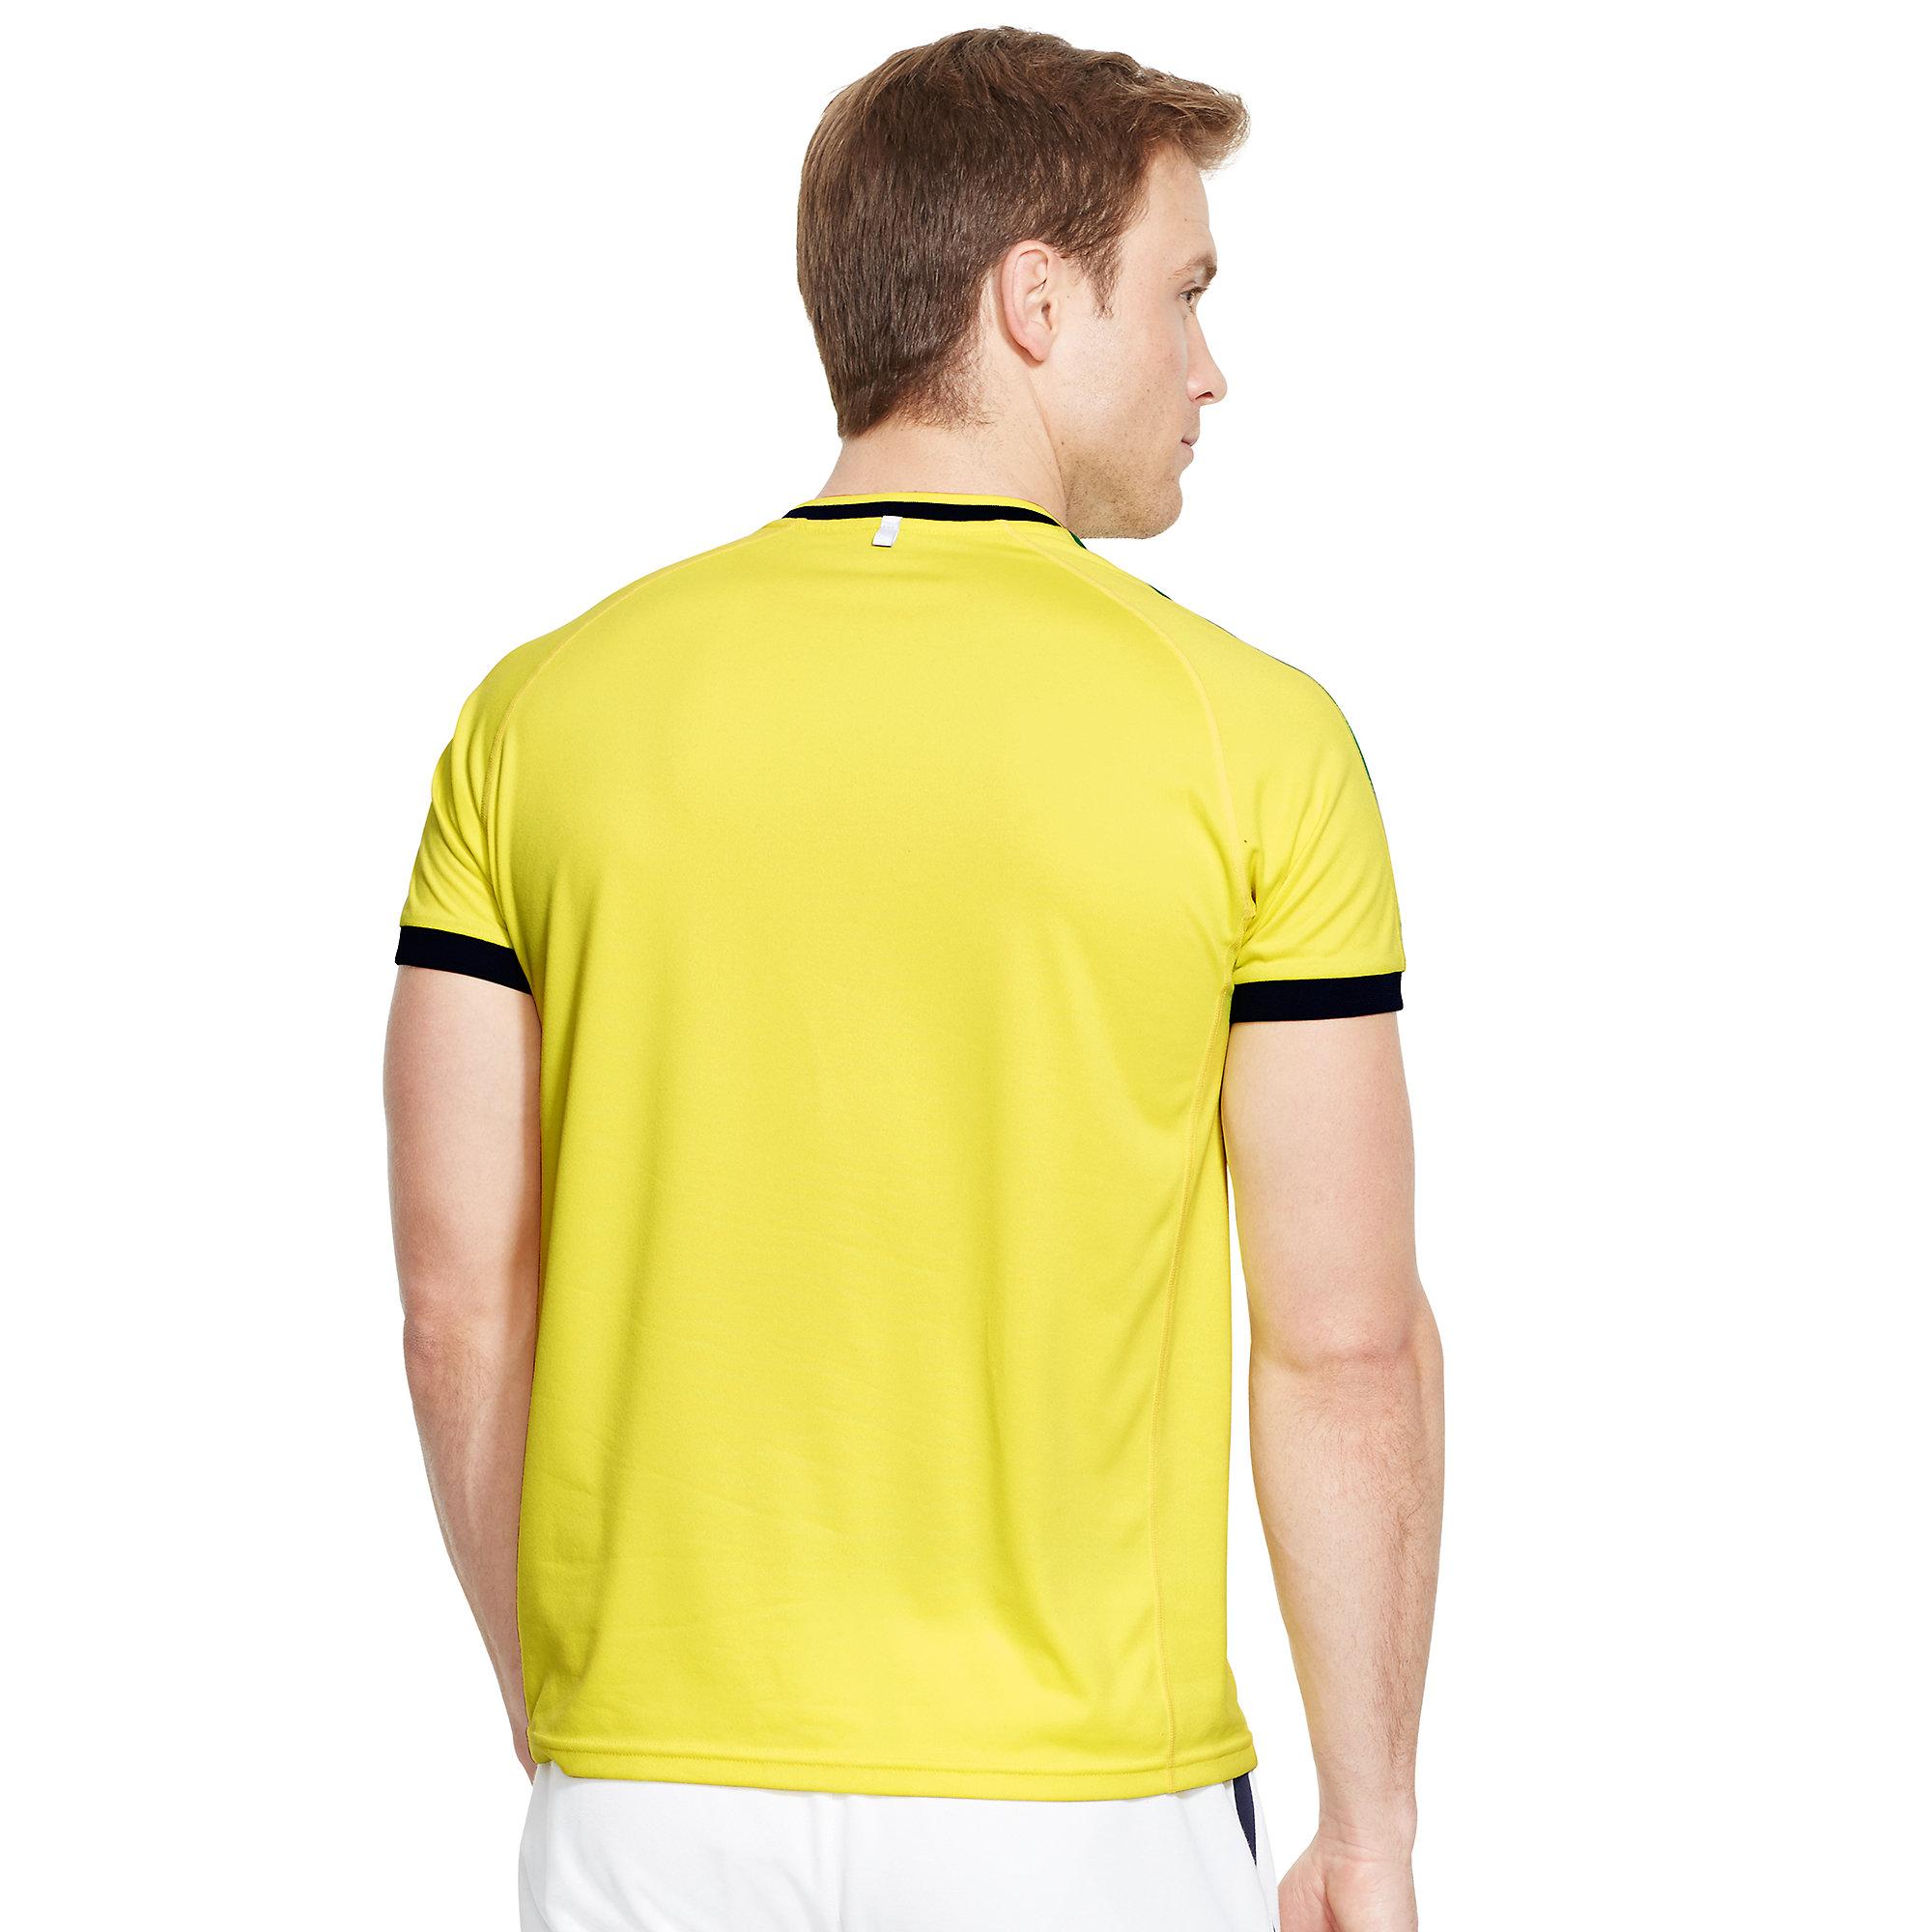 98192 Mockup Polo Ralph Shirt Brazil 8b738 Closeout Lauren Mesh stQdhCrxB